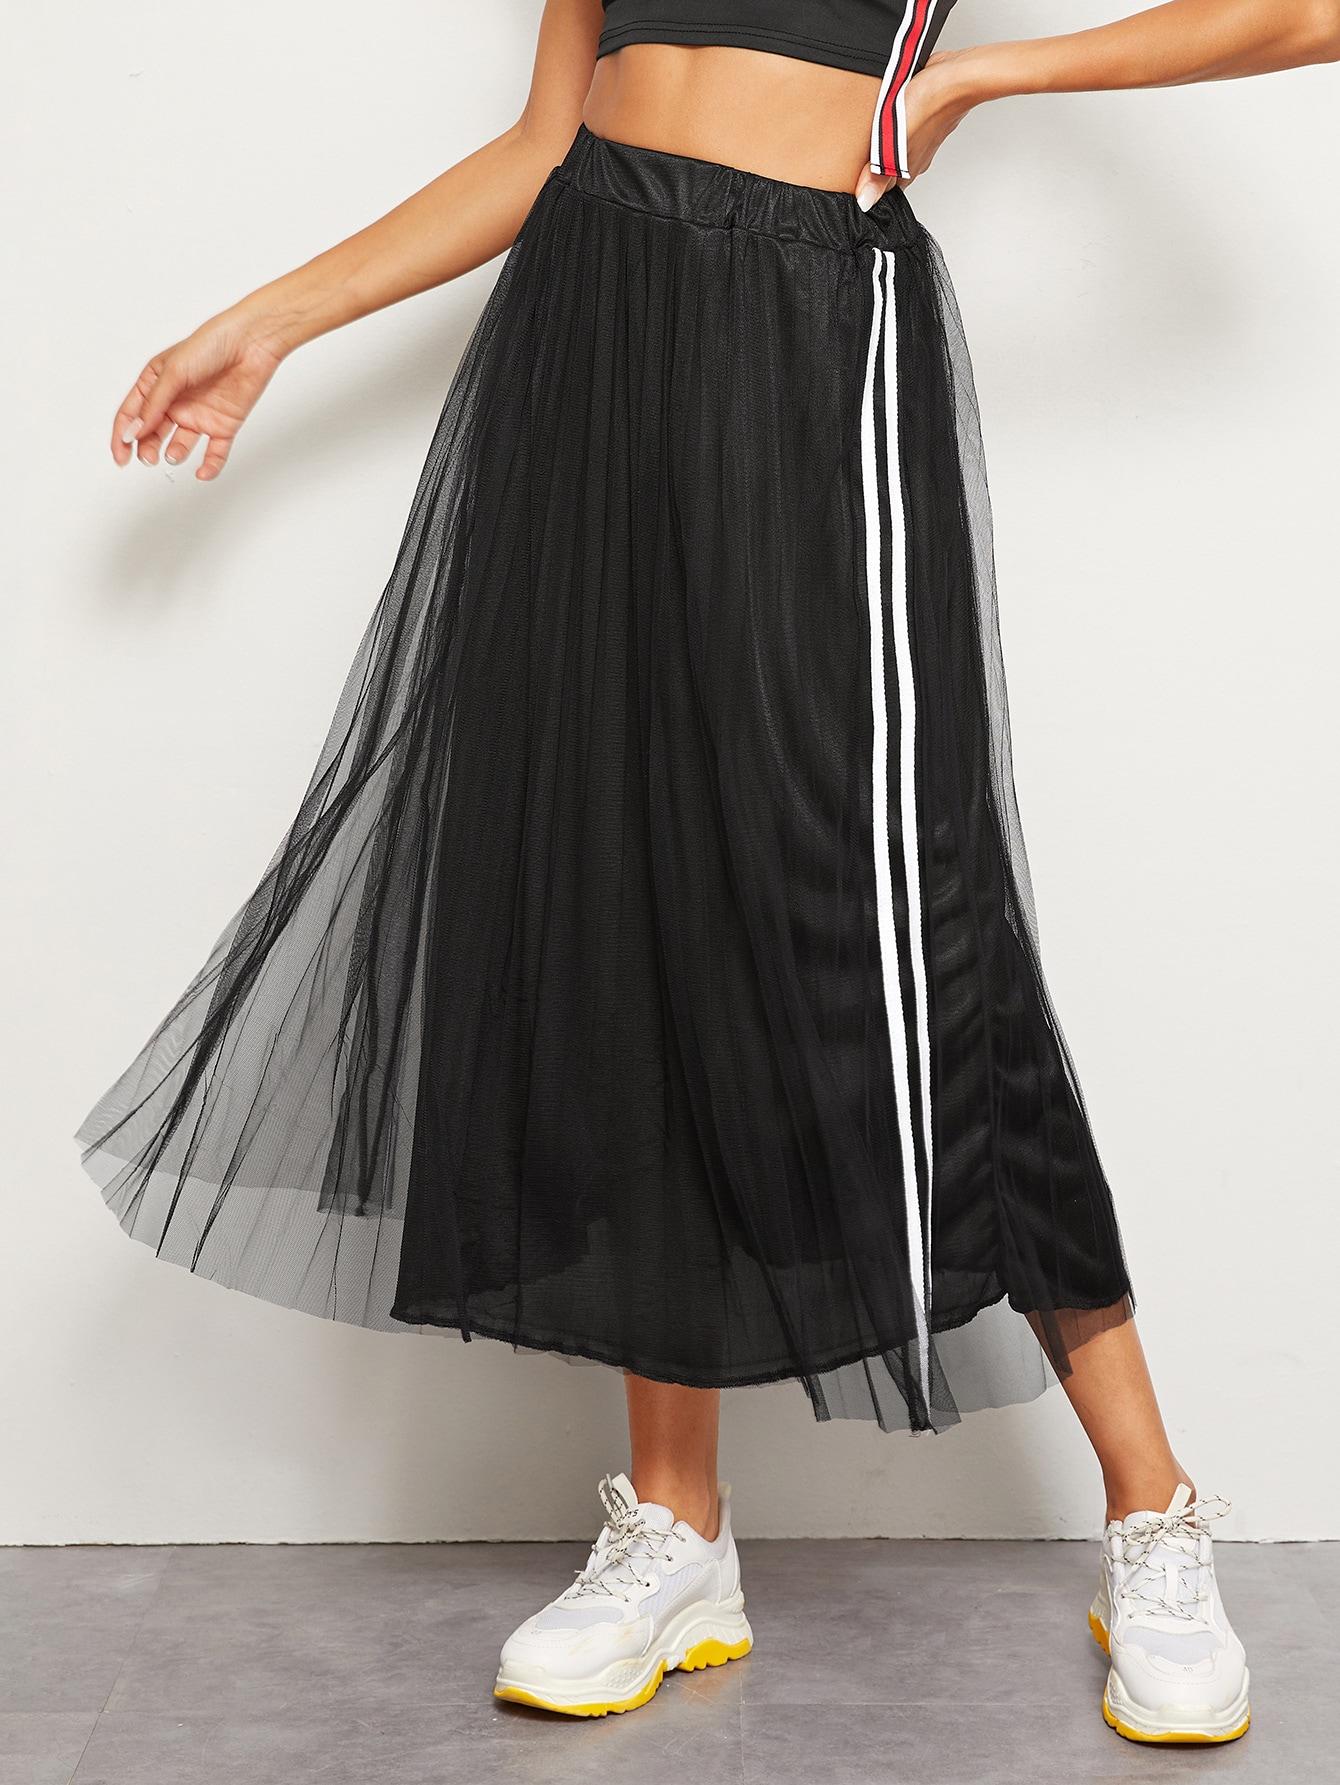 Фото - Сетчатая юбка с полосками от SheIn черного цвета